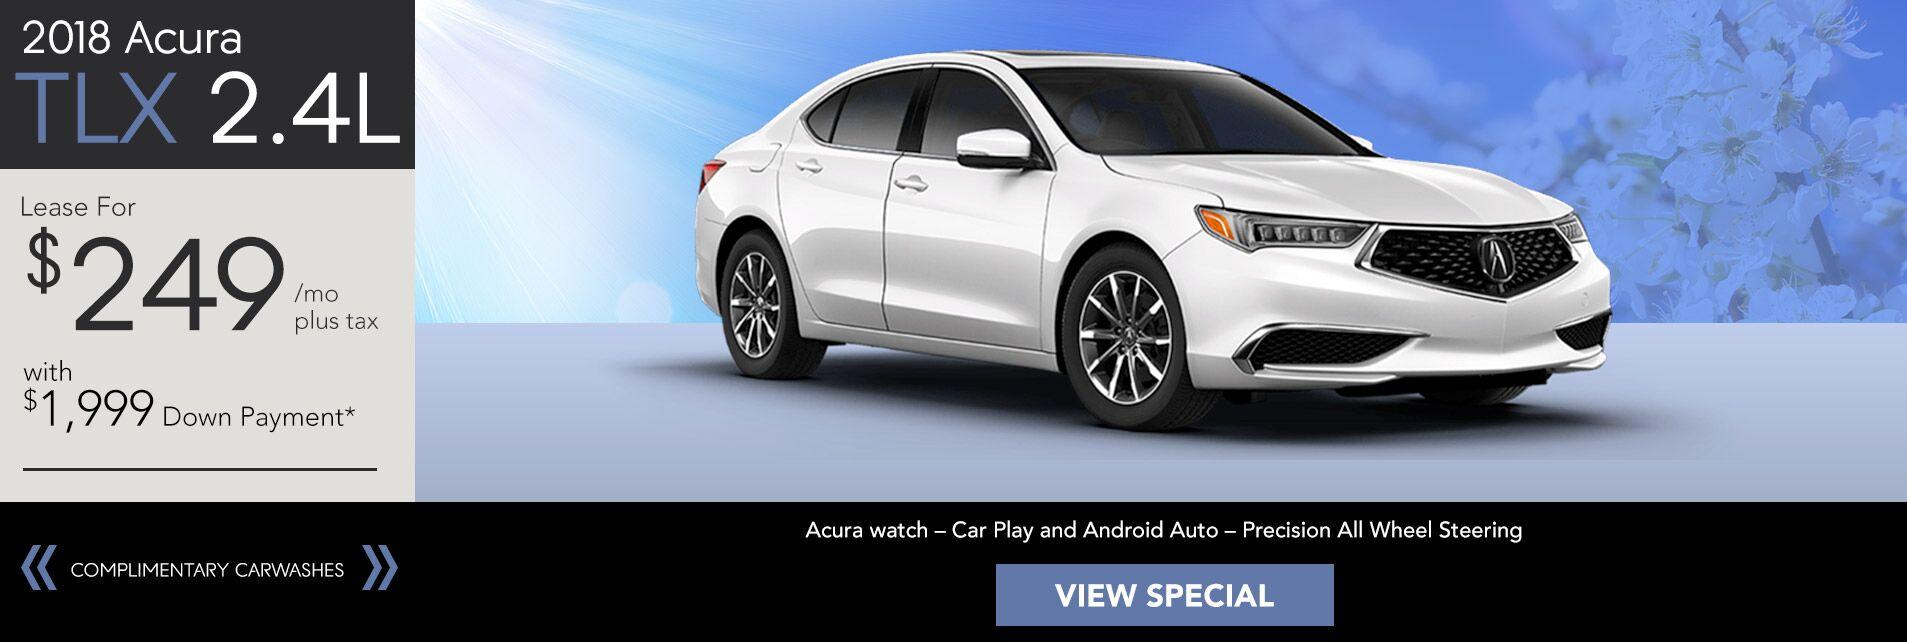 Scanlon Acura Fort Myers Fl Cars Com >> Galerie Von Acura Dealership Fort Myers Fl Used Cars Scanlon Acura